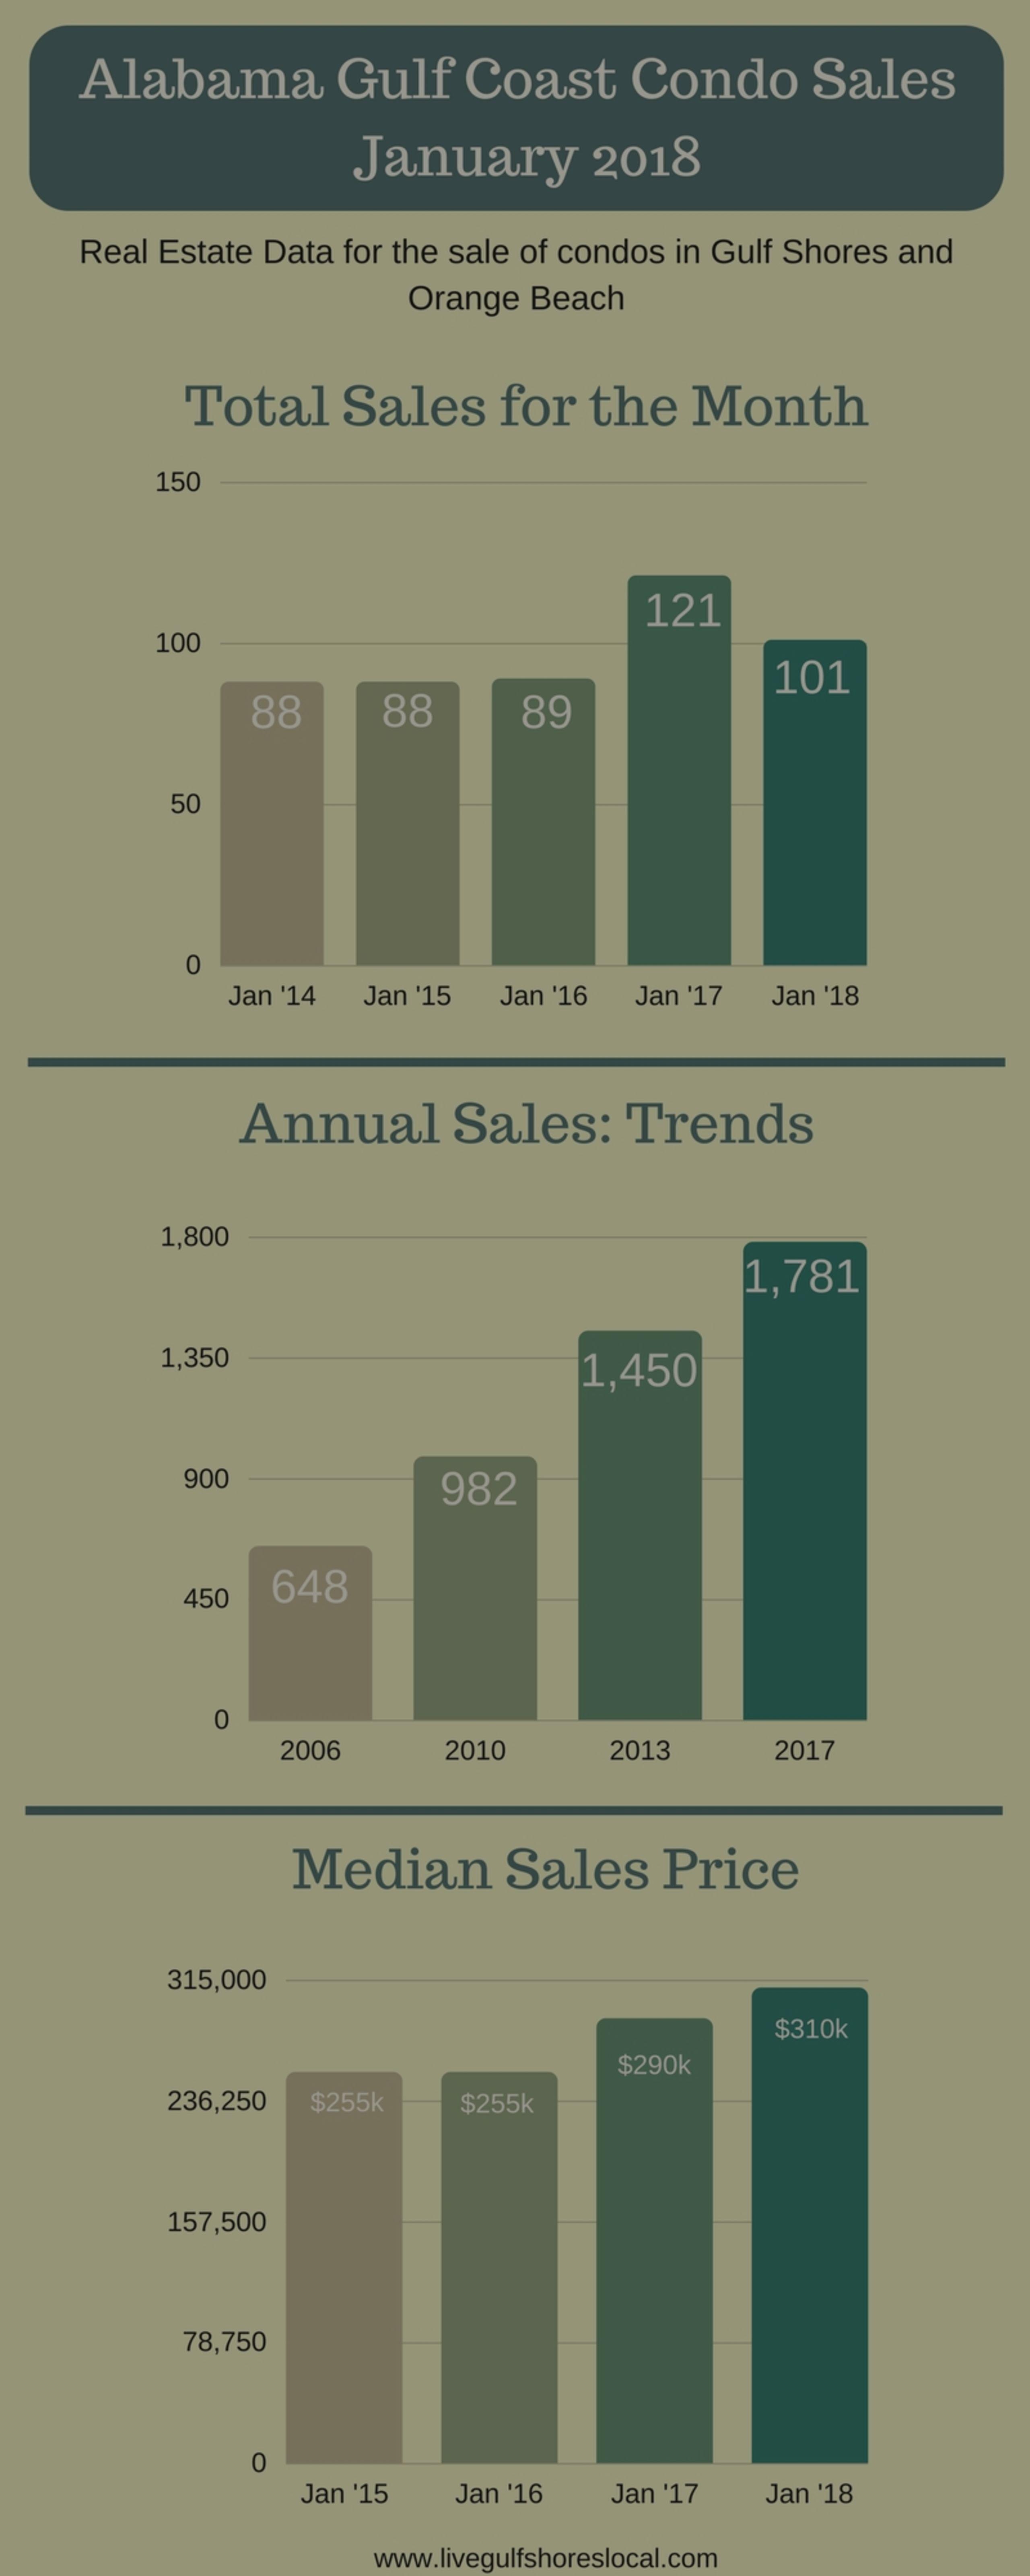 Alabama Gulf Coast Condo Sales – January 2018